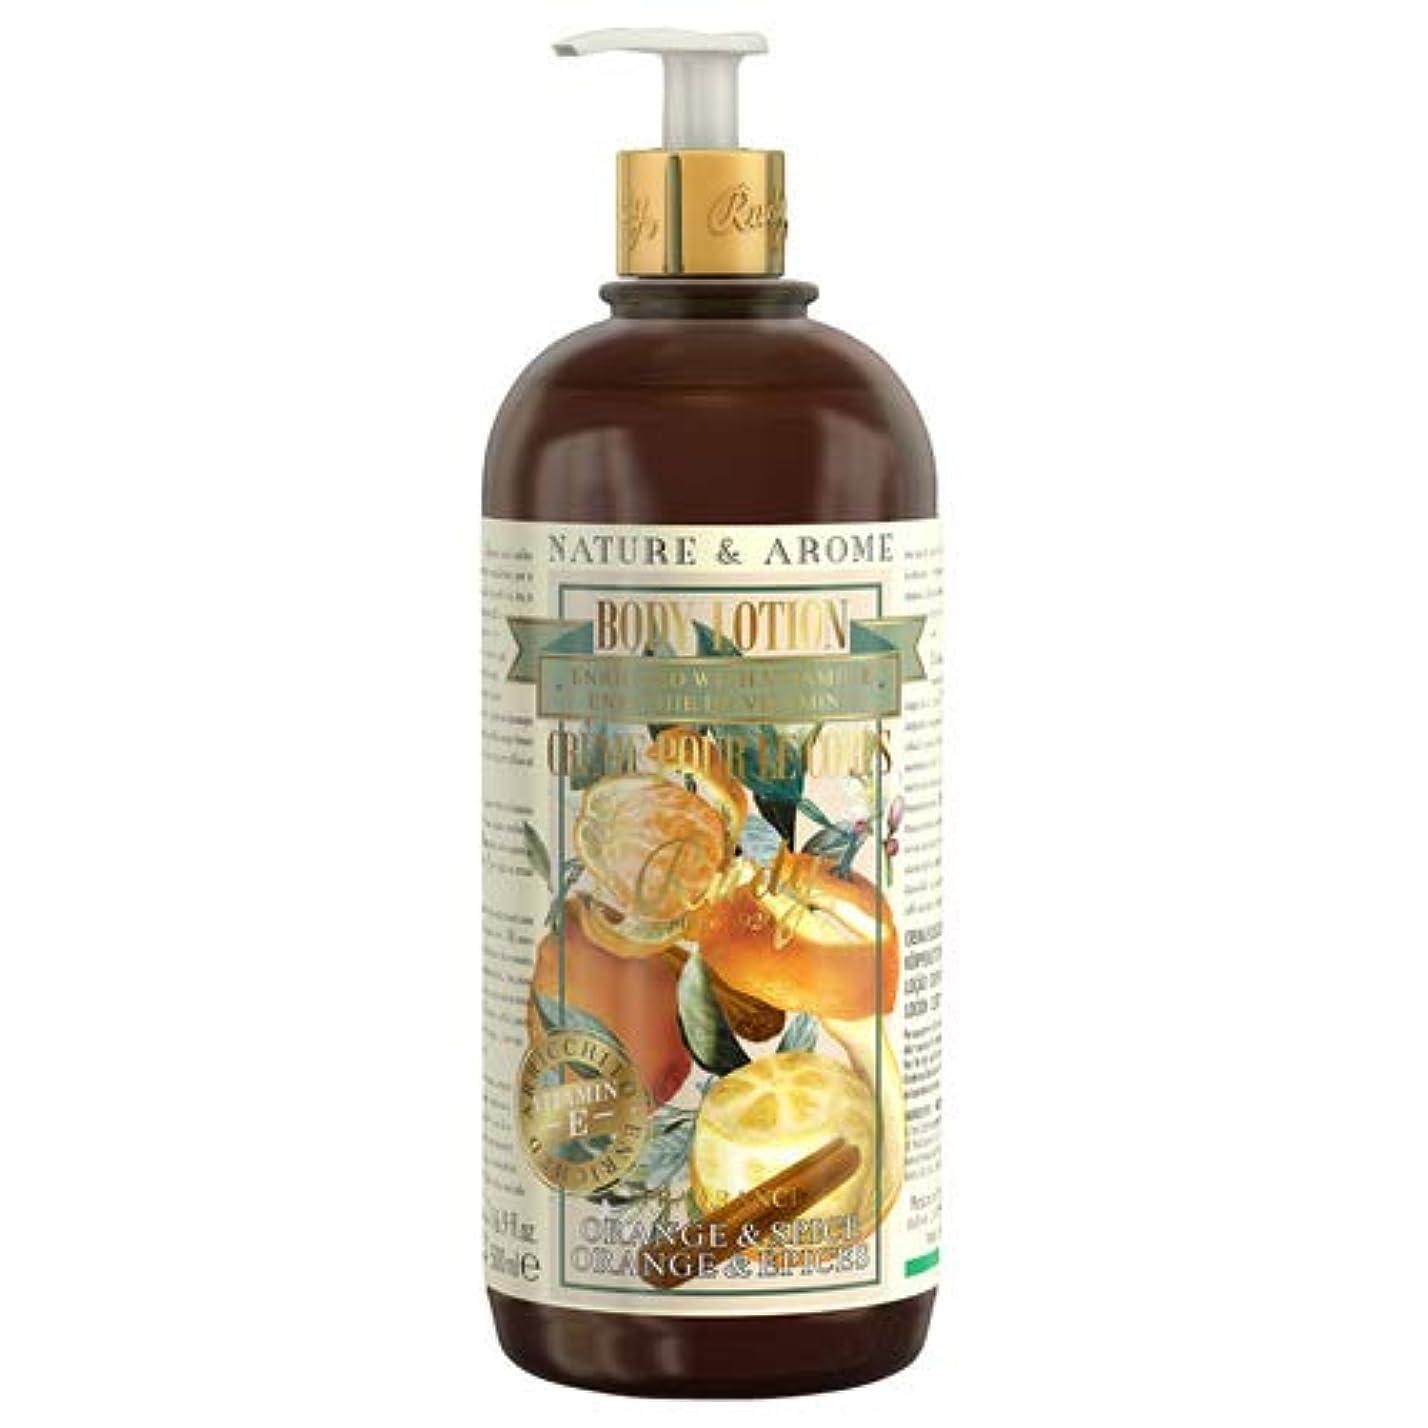 RUDY Nature&Arome Apothecary ネイチャーアロマ アポセカリー Body Lotion ボディローション Orange & Spice オレンジ&スパイス